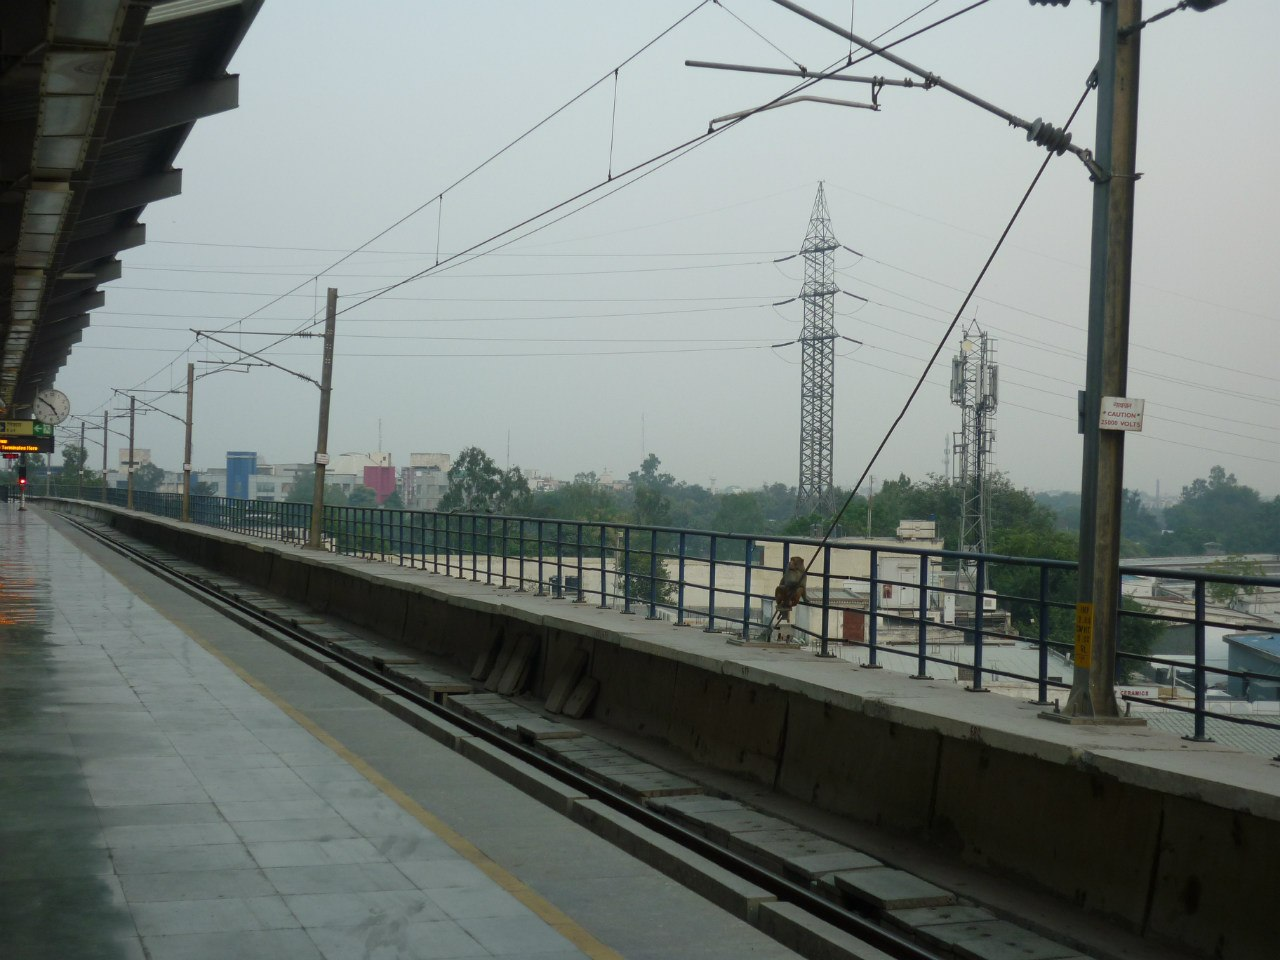 Дели. Метро. Станция Султанпур